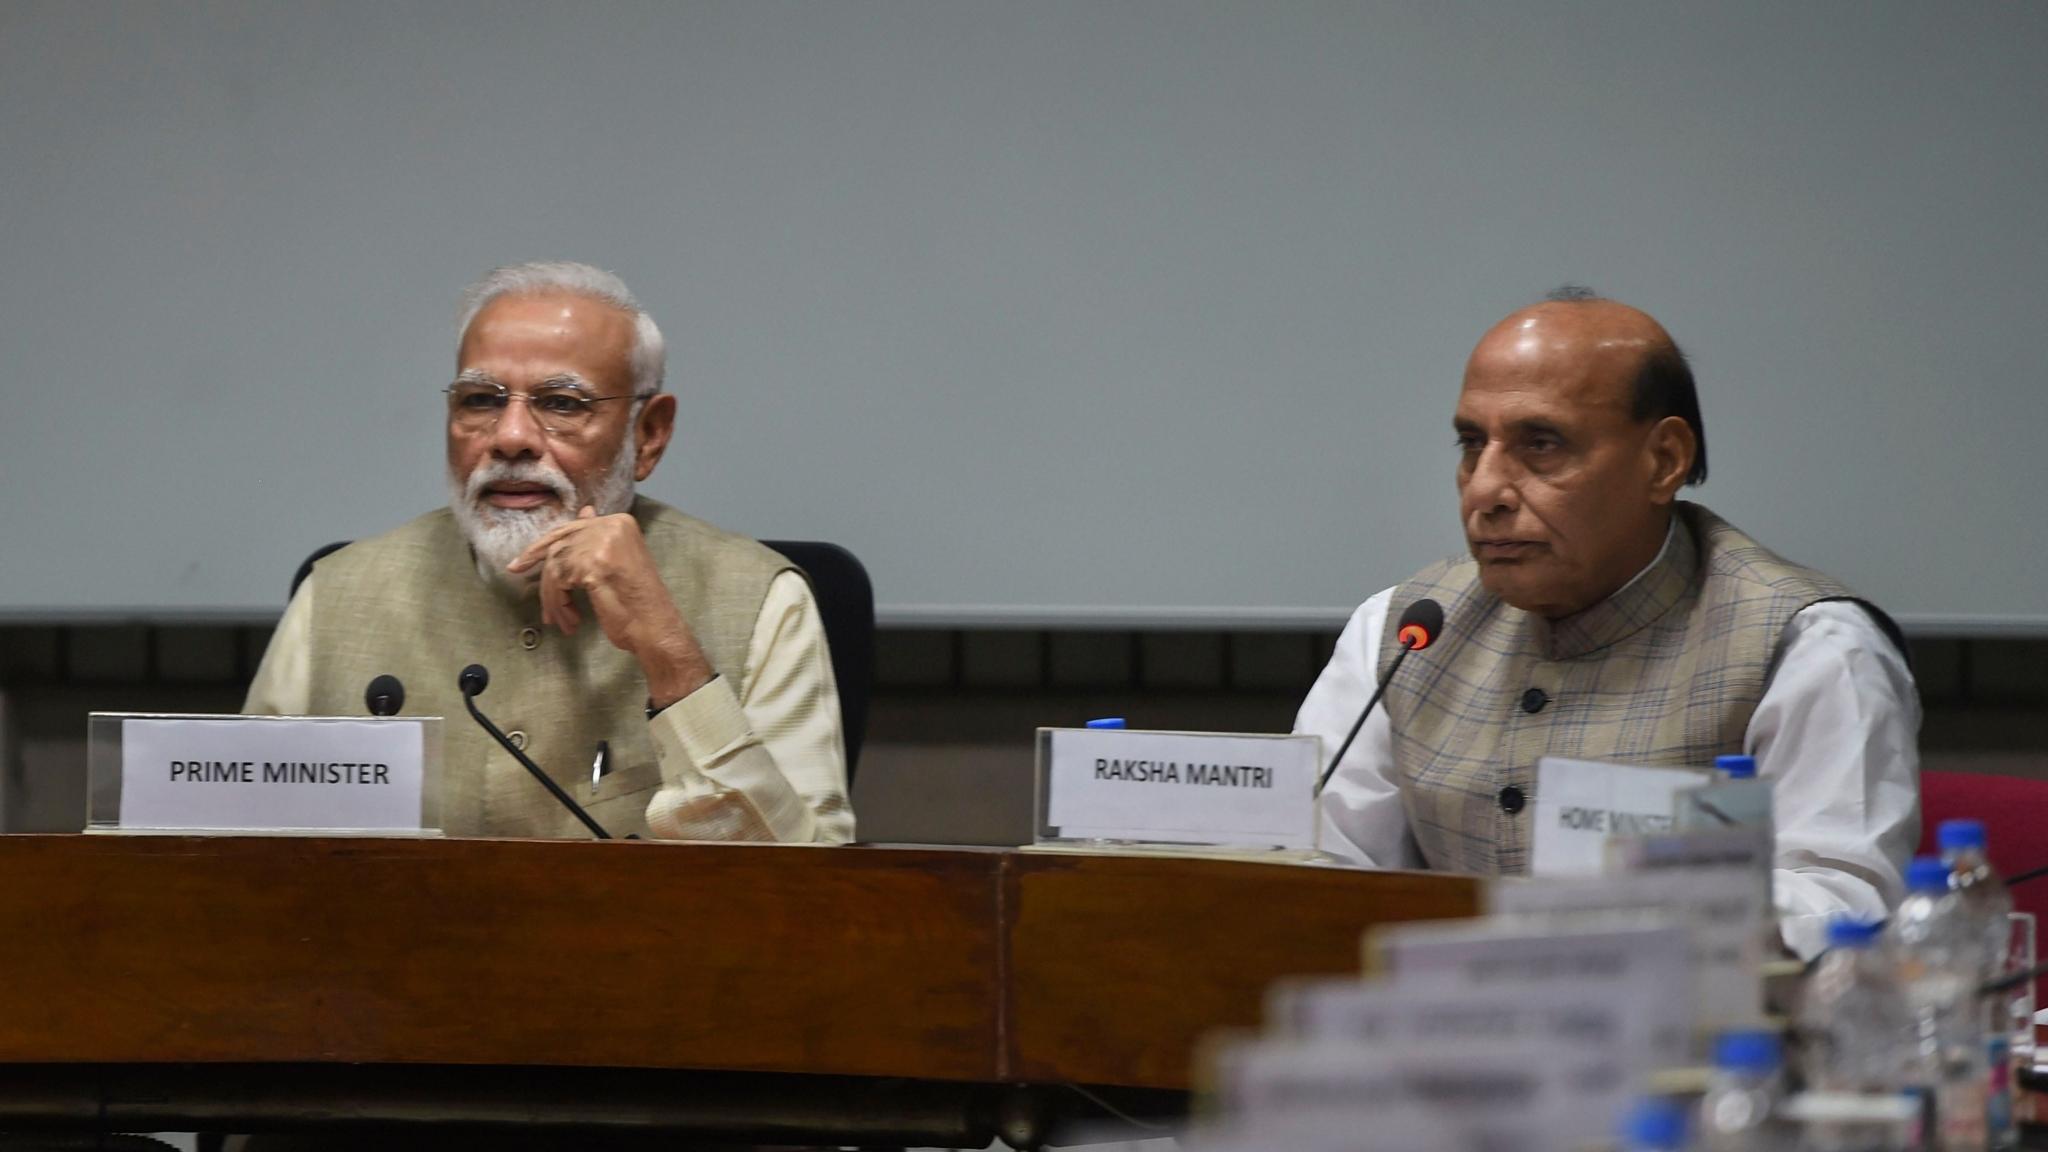 QBullet: Panel to Study Simultaneous Polls; Bihar Death Toll 128